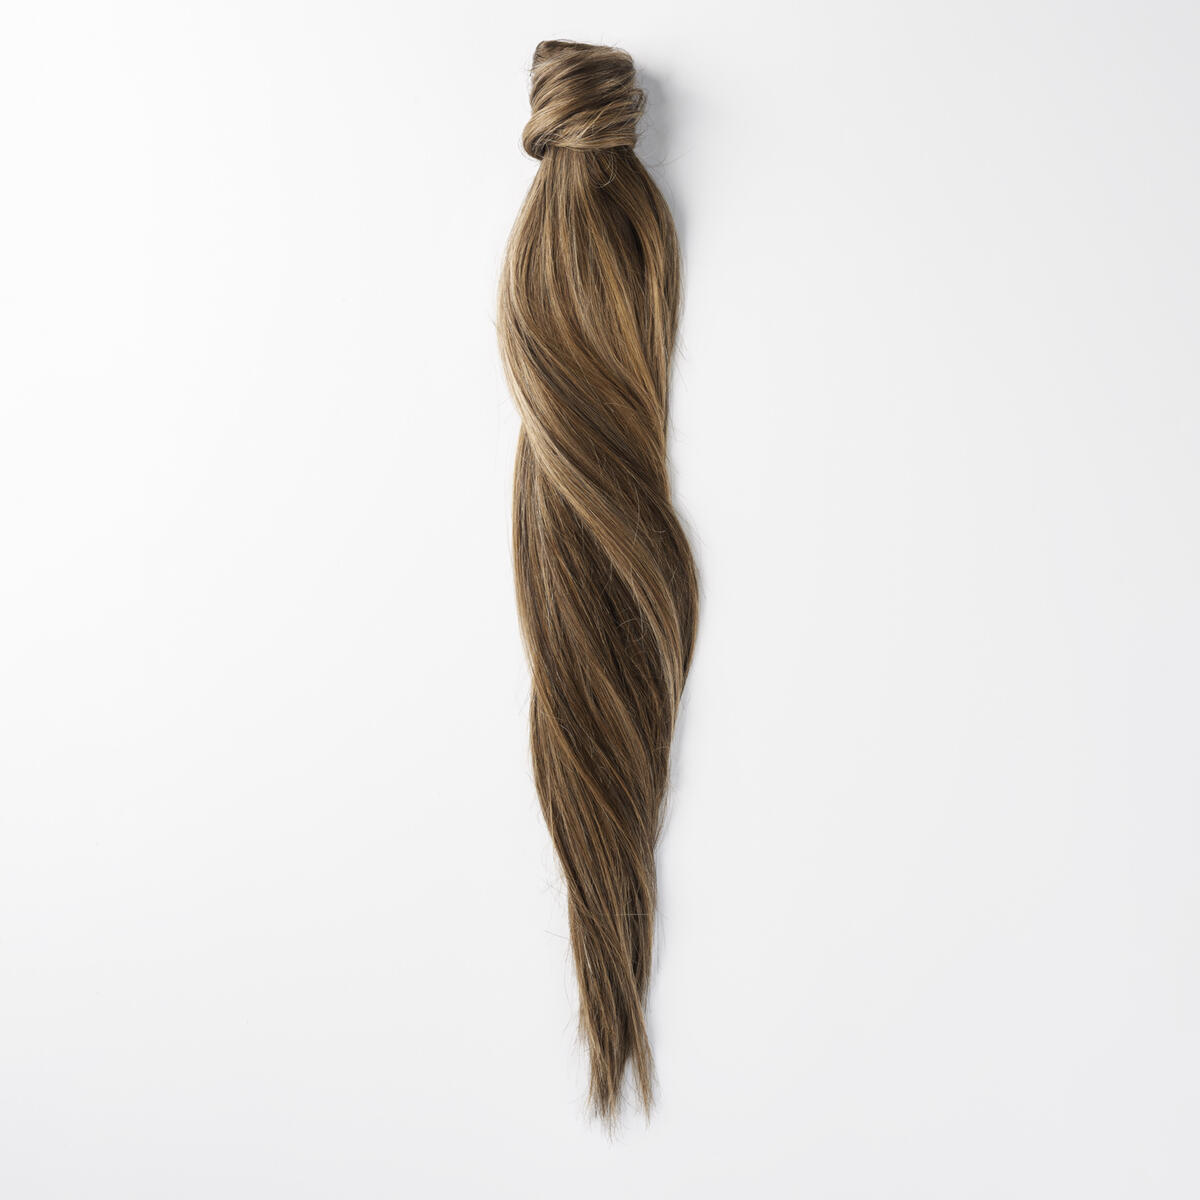 Clip-in Ponytail Ponytail made of real hair B2.3/5.0 Hazelnut Caramel Balayage 50 cm